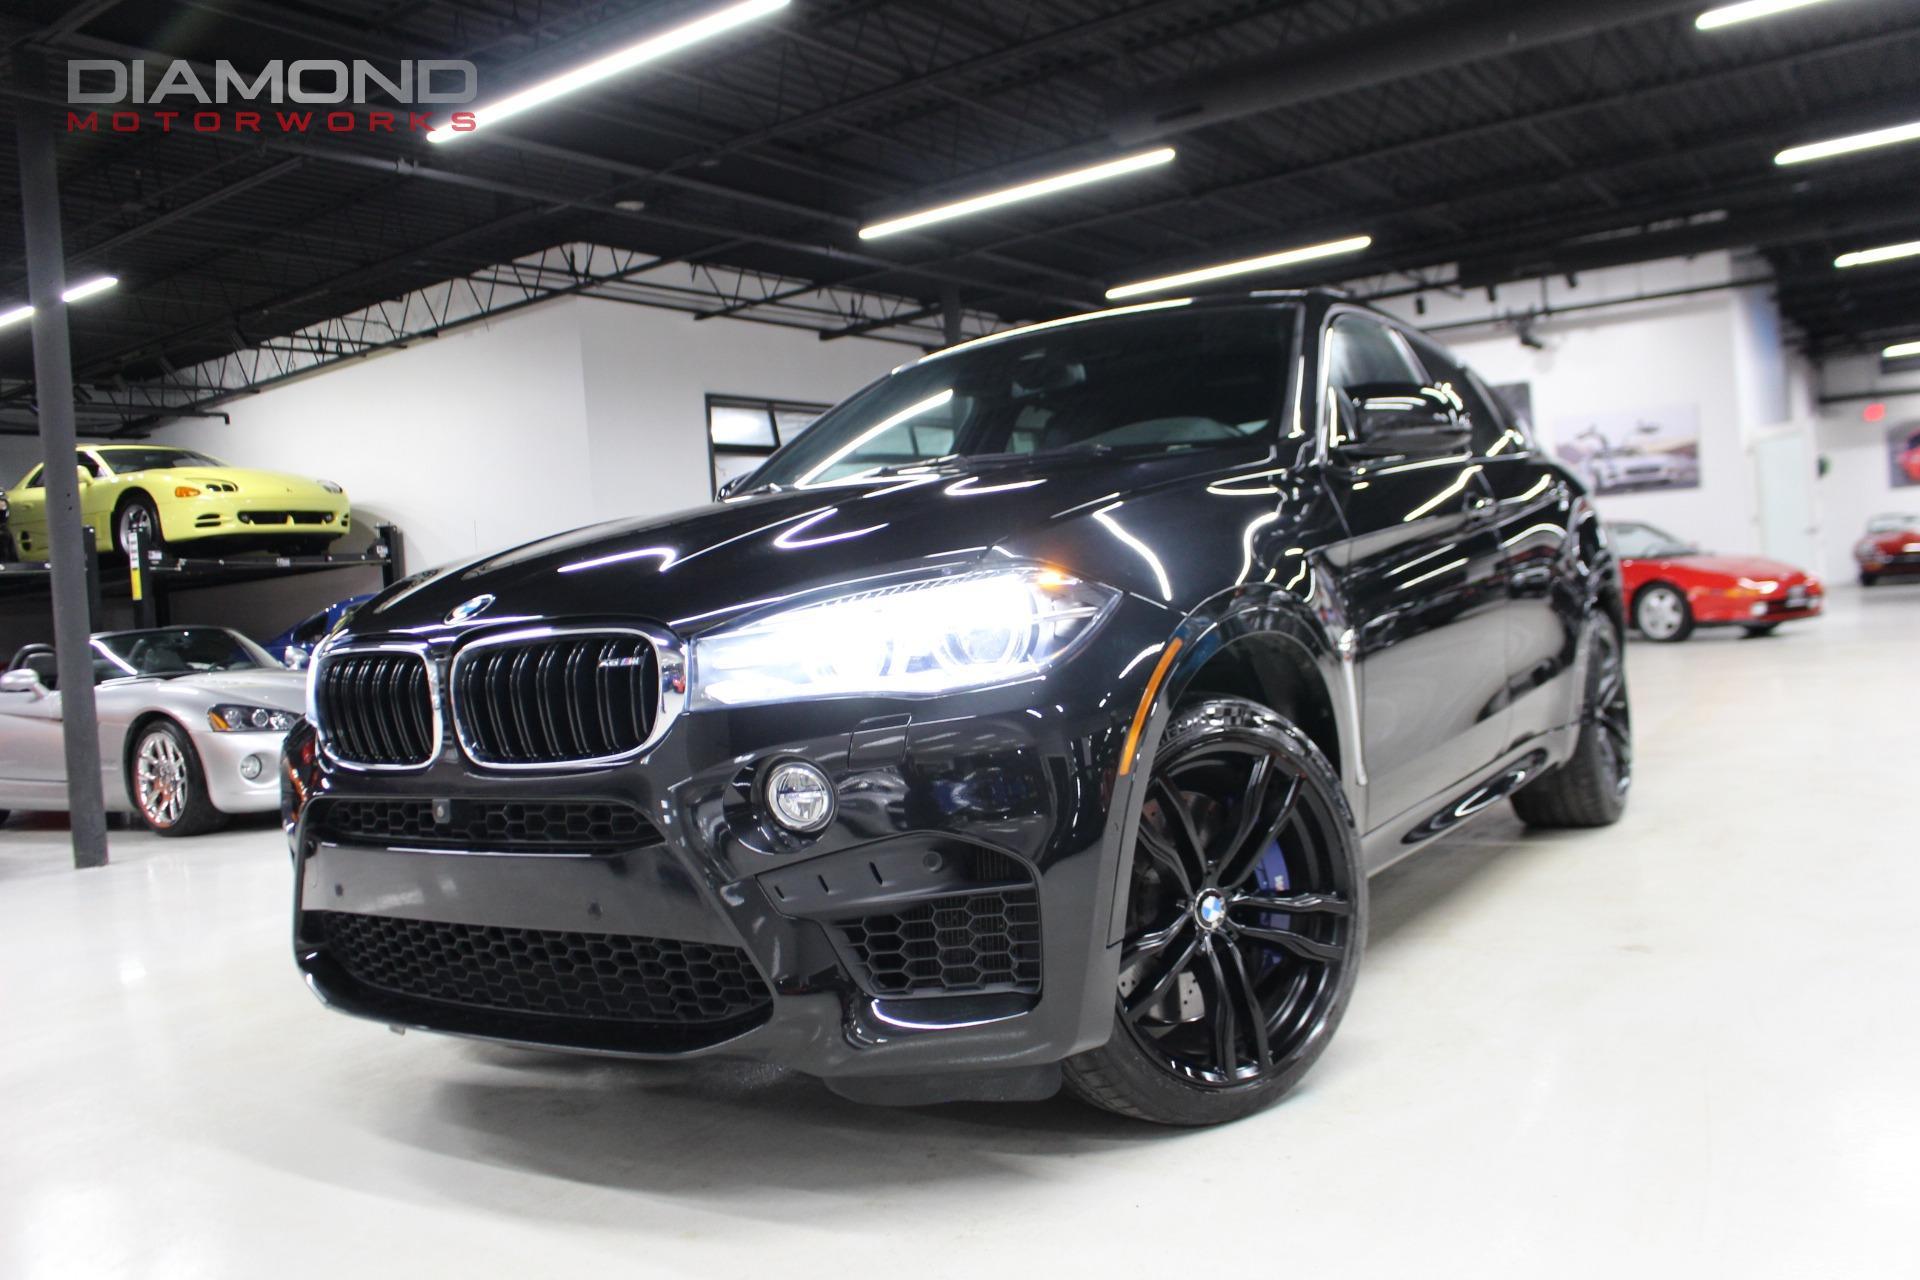 Used-2018-BMW-X6-M